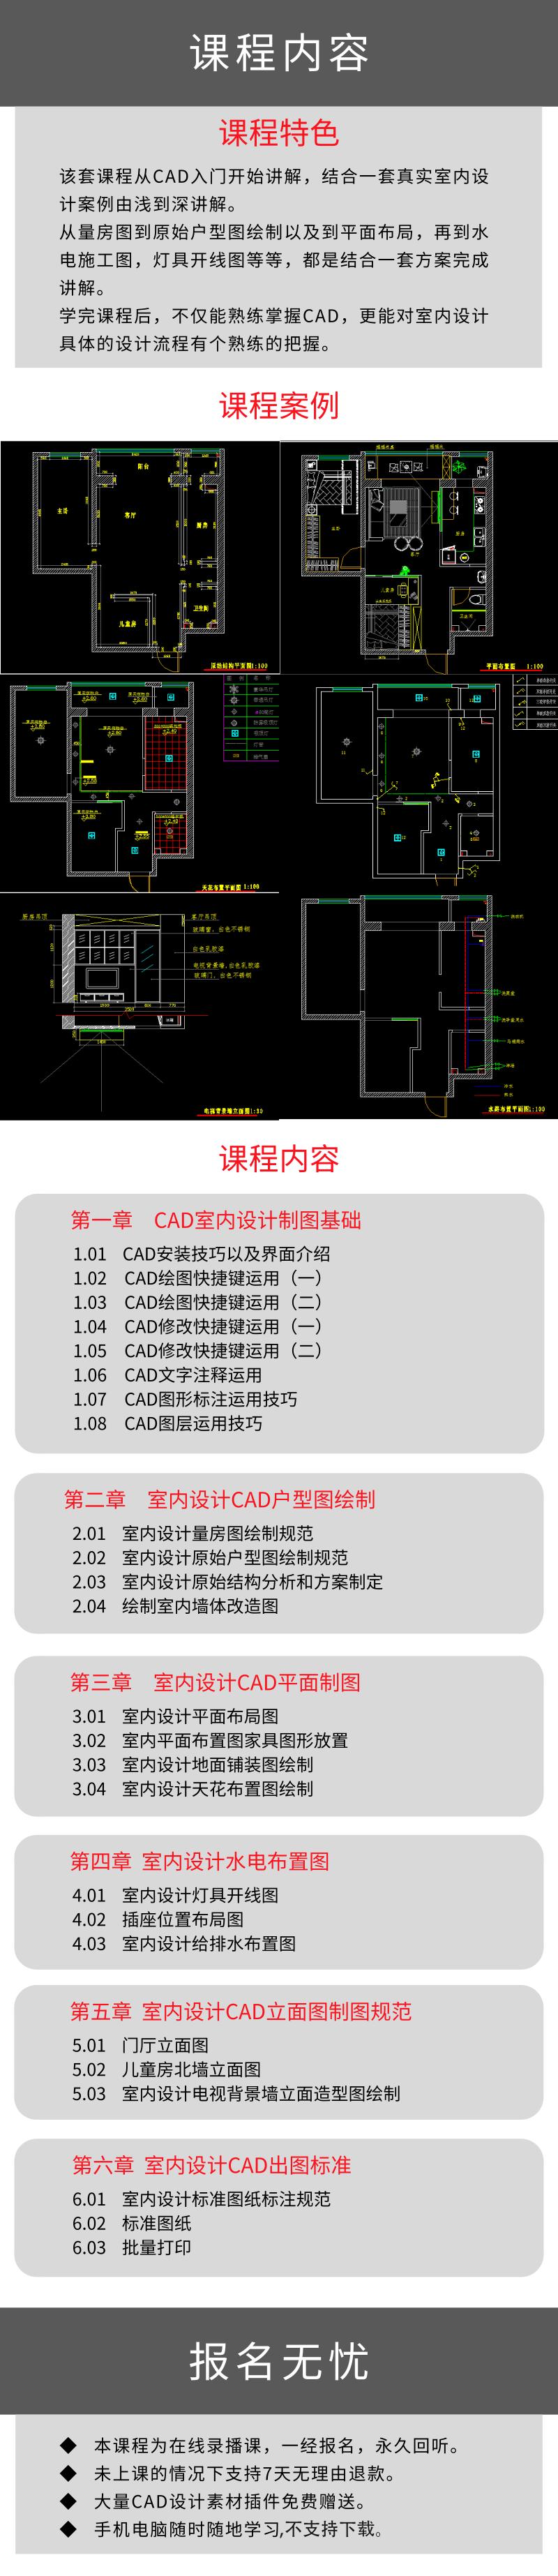 CAD2007室内设计制图全能班